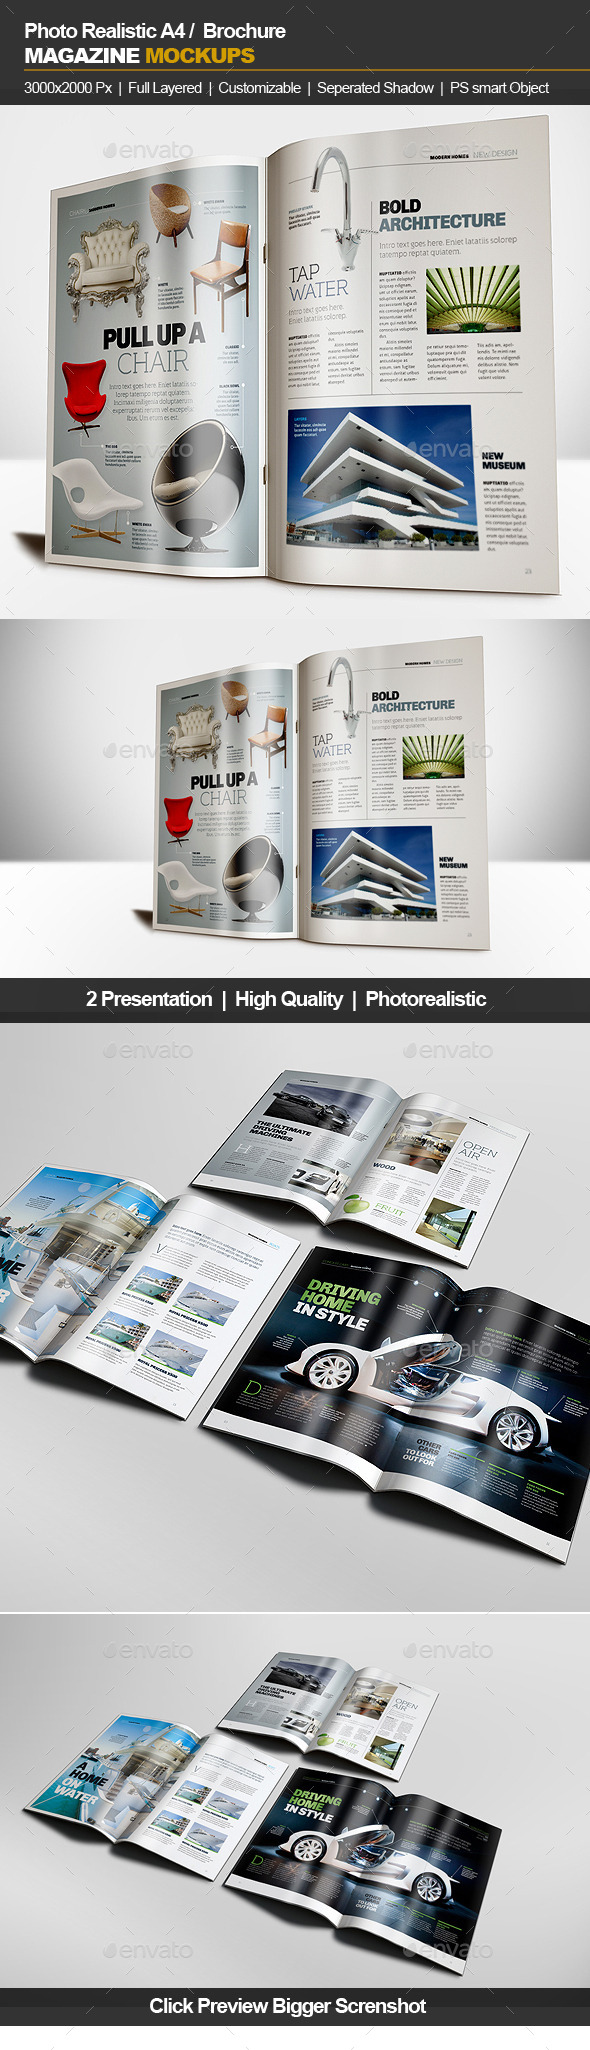 A4 Brochure Magazine Mockup - Brochures Print